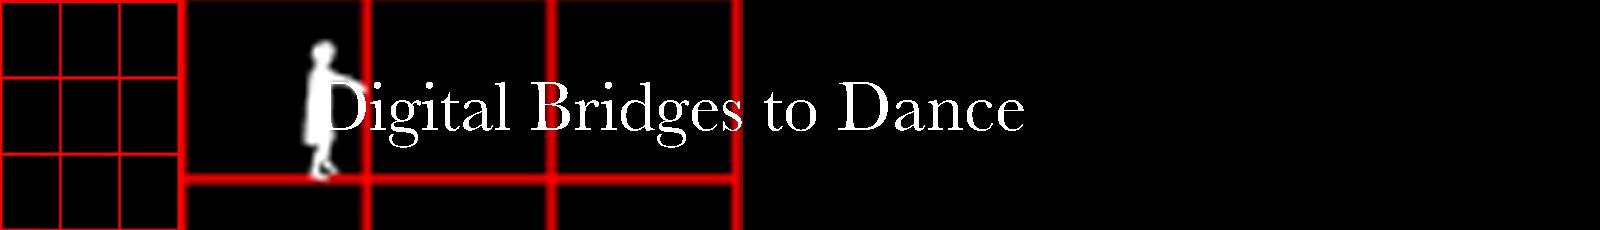 Digital Bridges to Dance header image